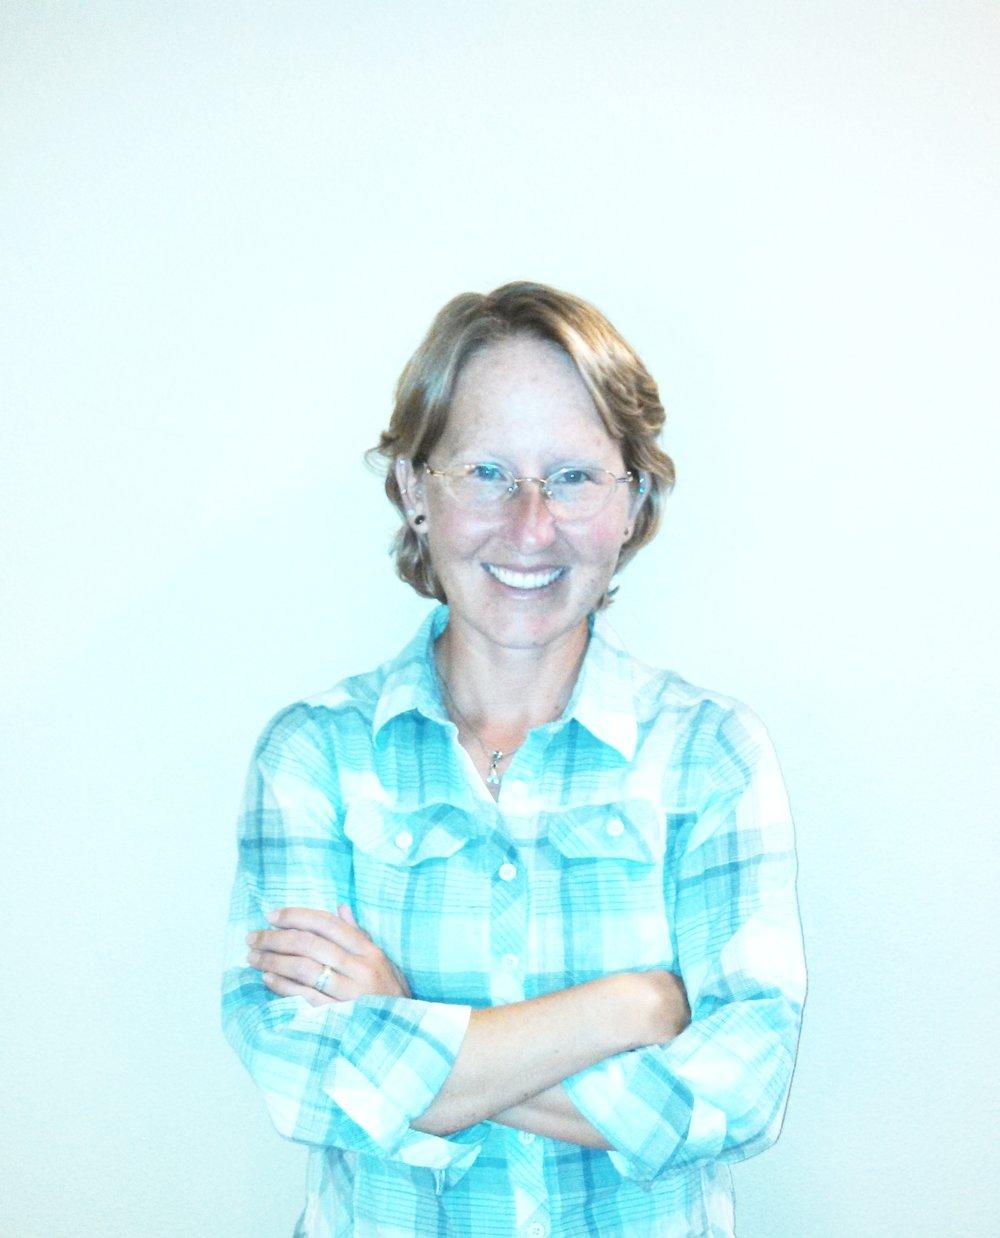 Dr. Kate Zeigler,PhD - Geologist